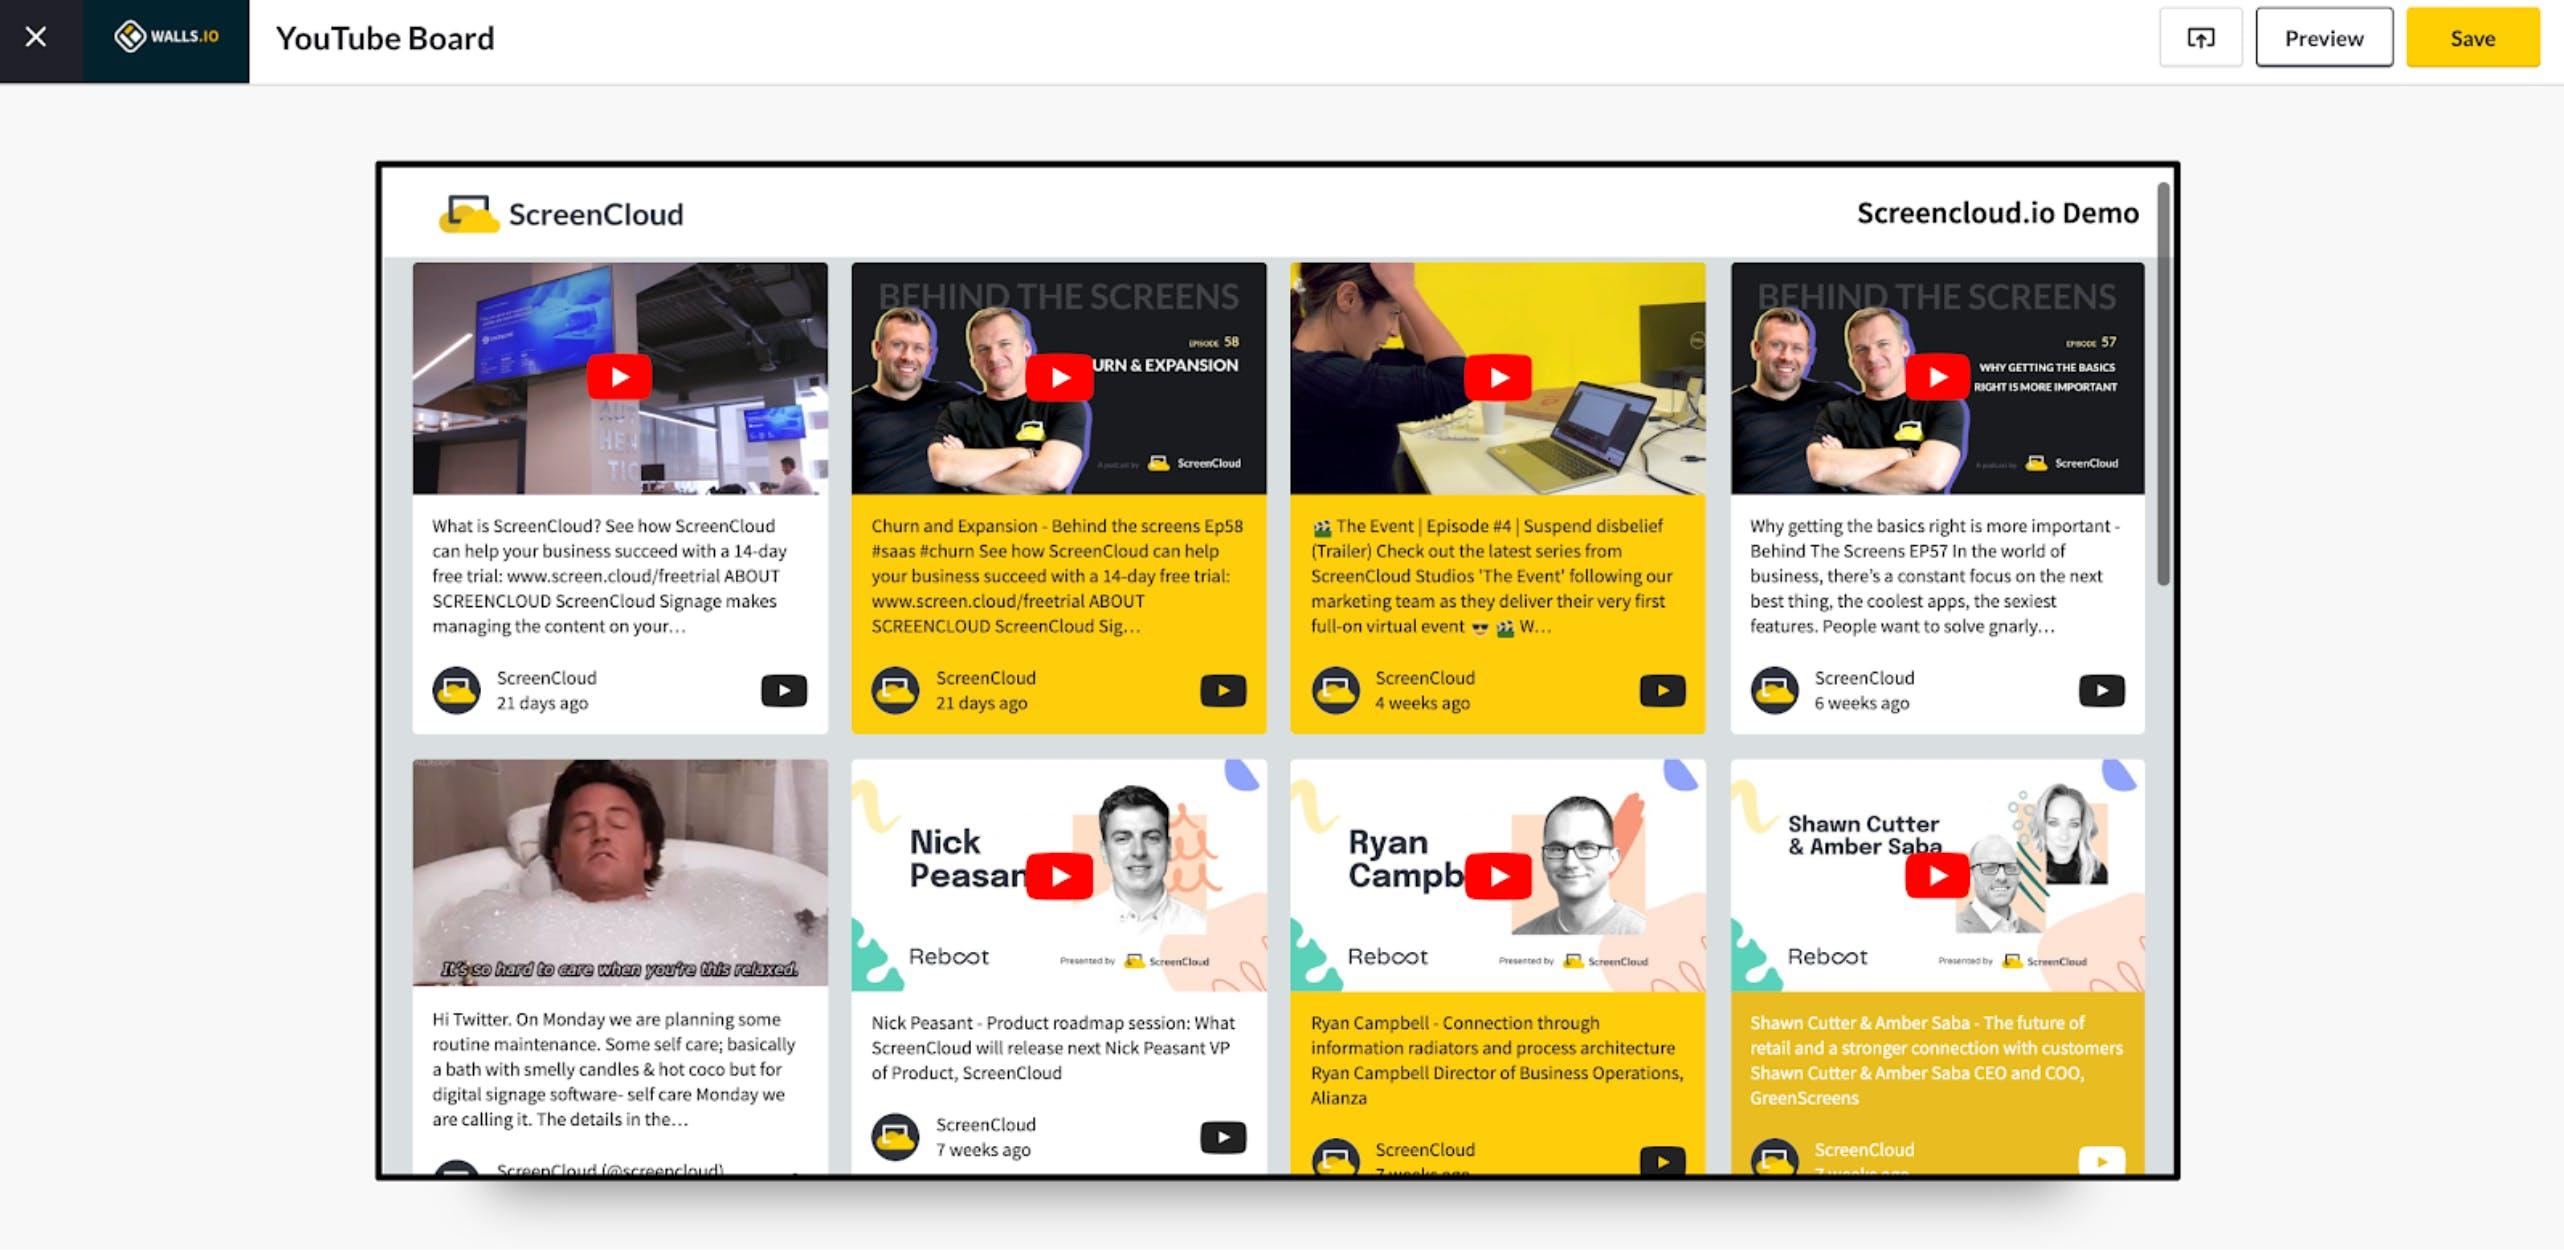 ScreenCloud Walls.io App Guide - Preview App 1.21.2021.png